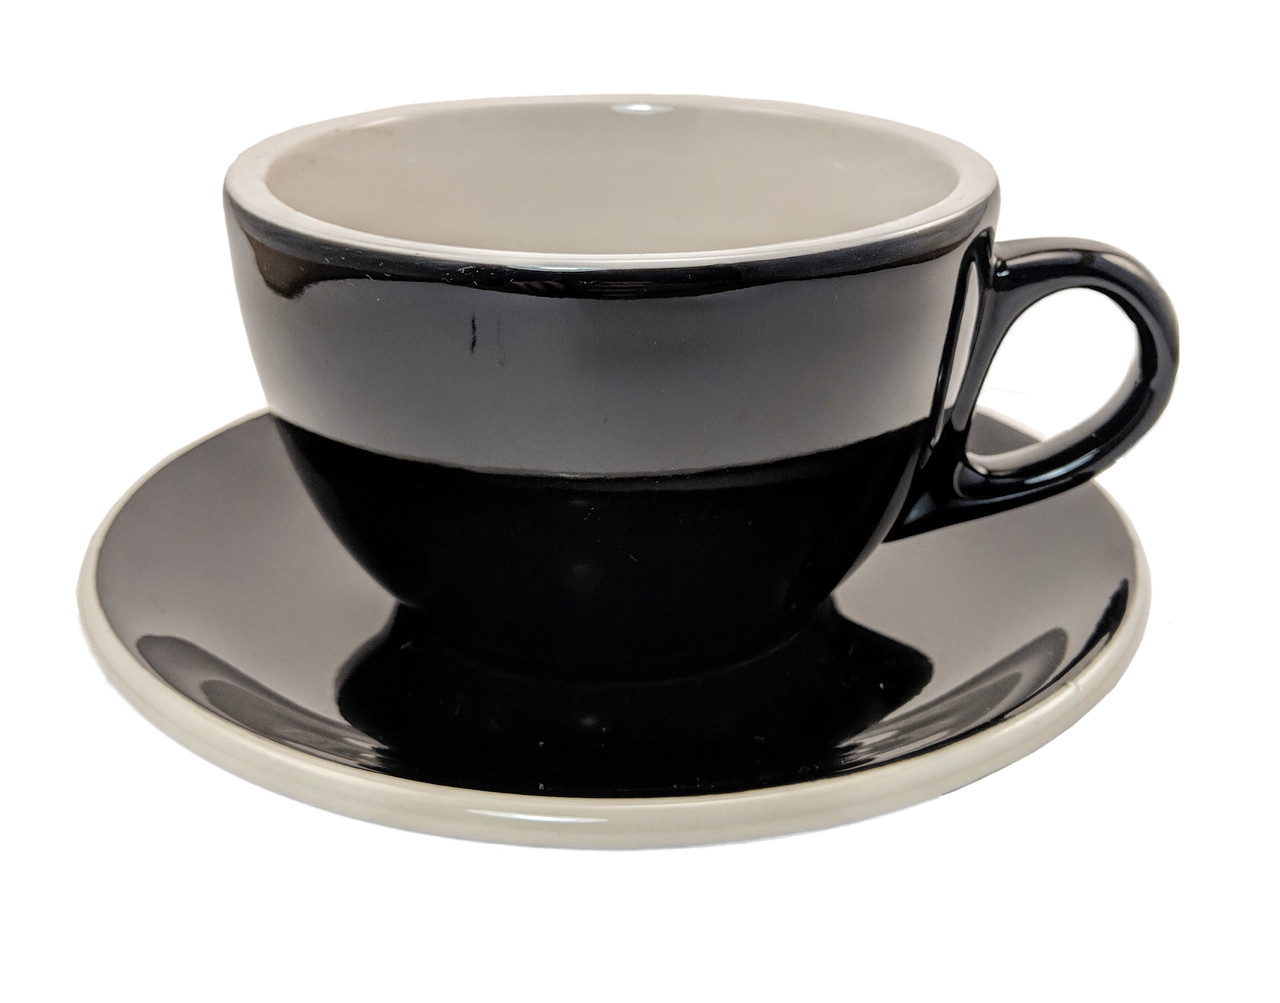 Revolution Classic Cup & Saucer Set, Black